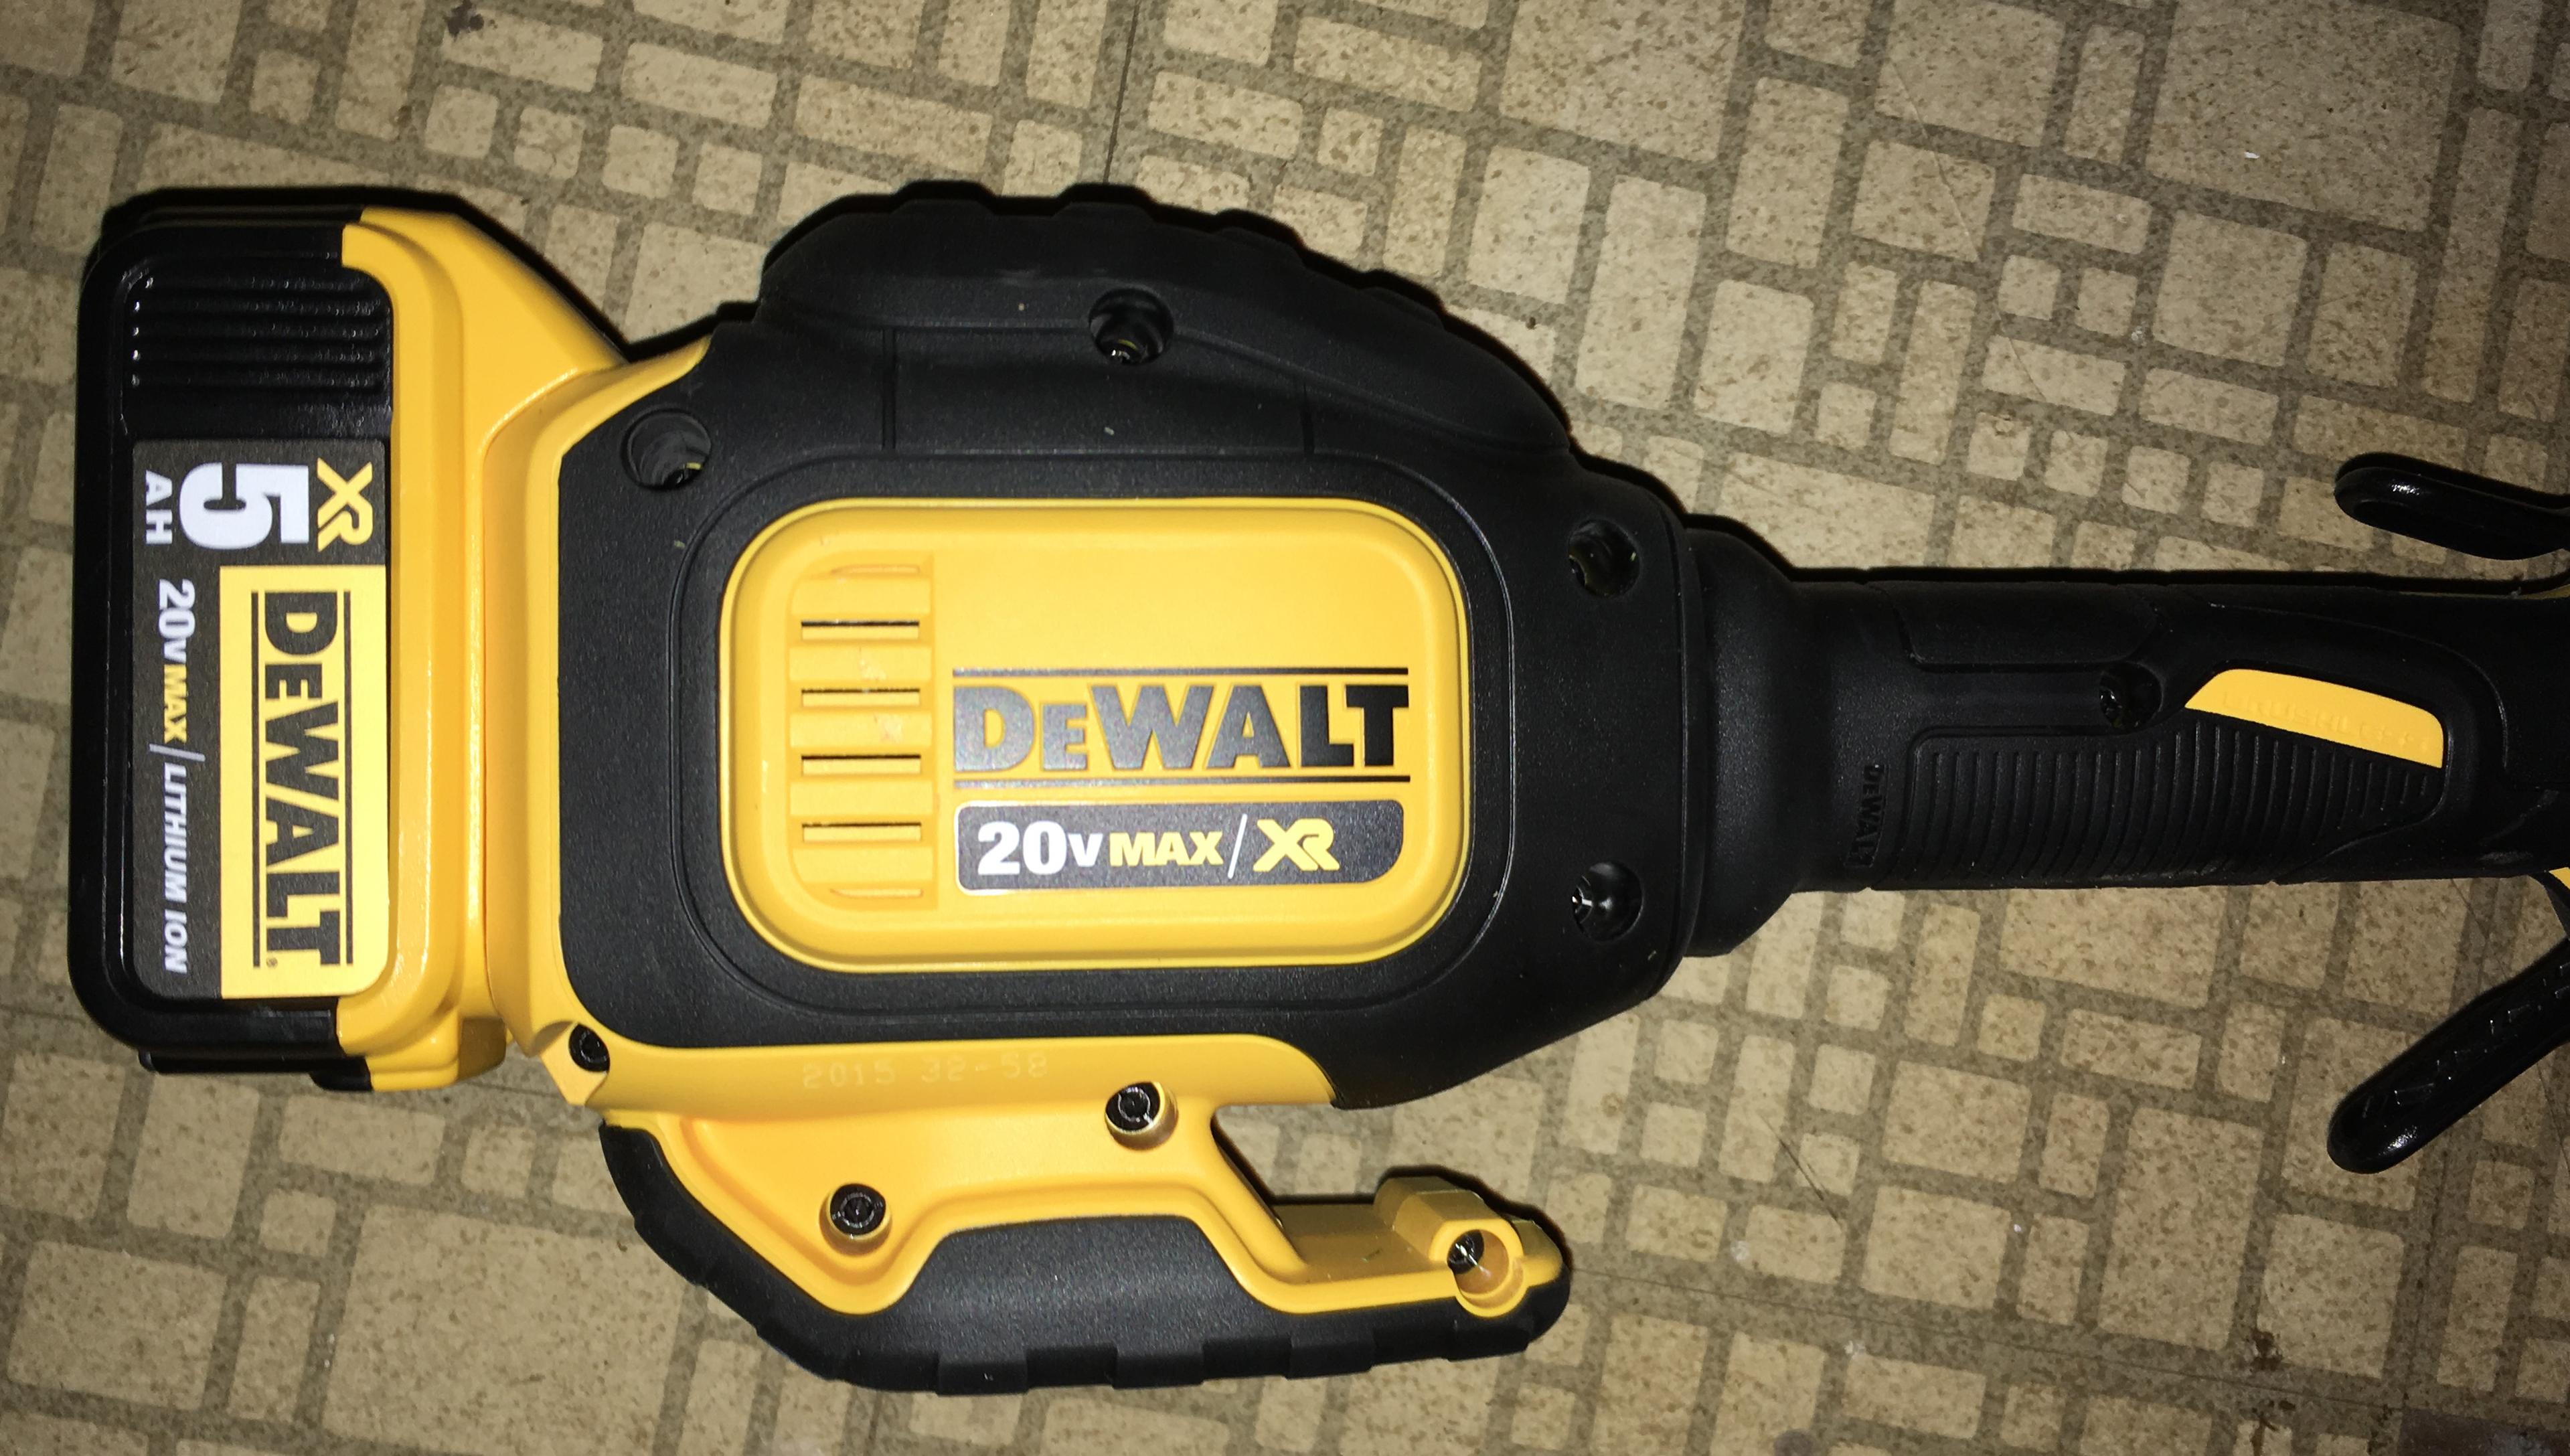 DEWALT DCST920P1 20V MAX 50 Ah Lithium Ion XR Brushless String